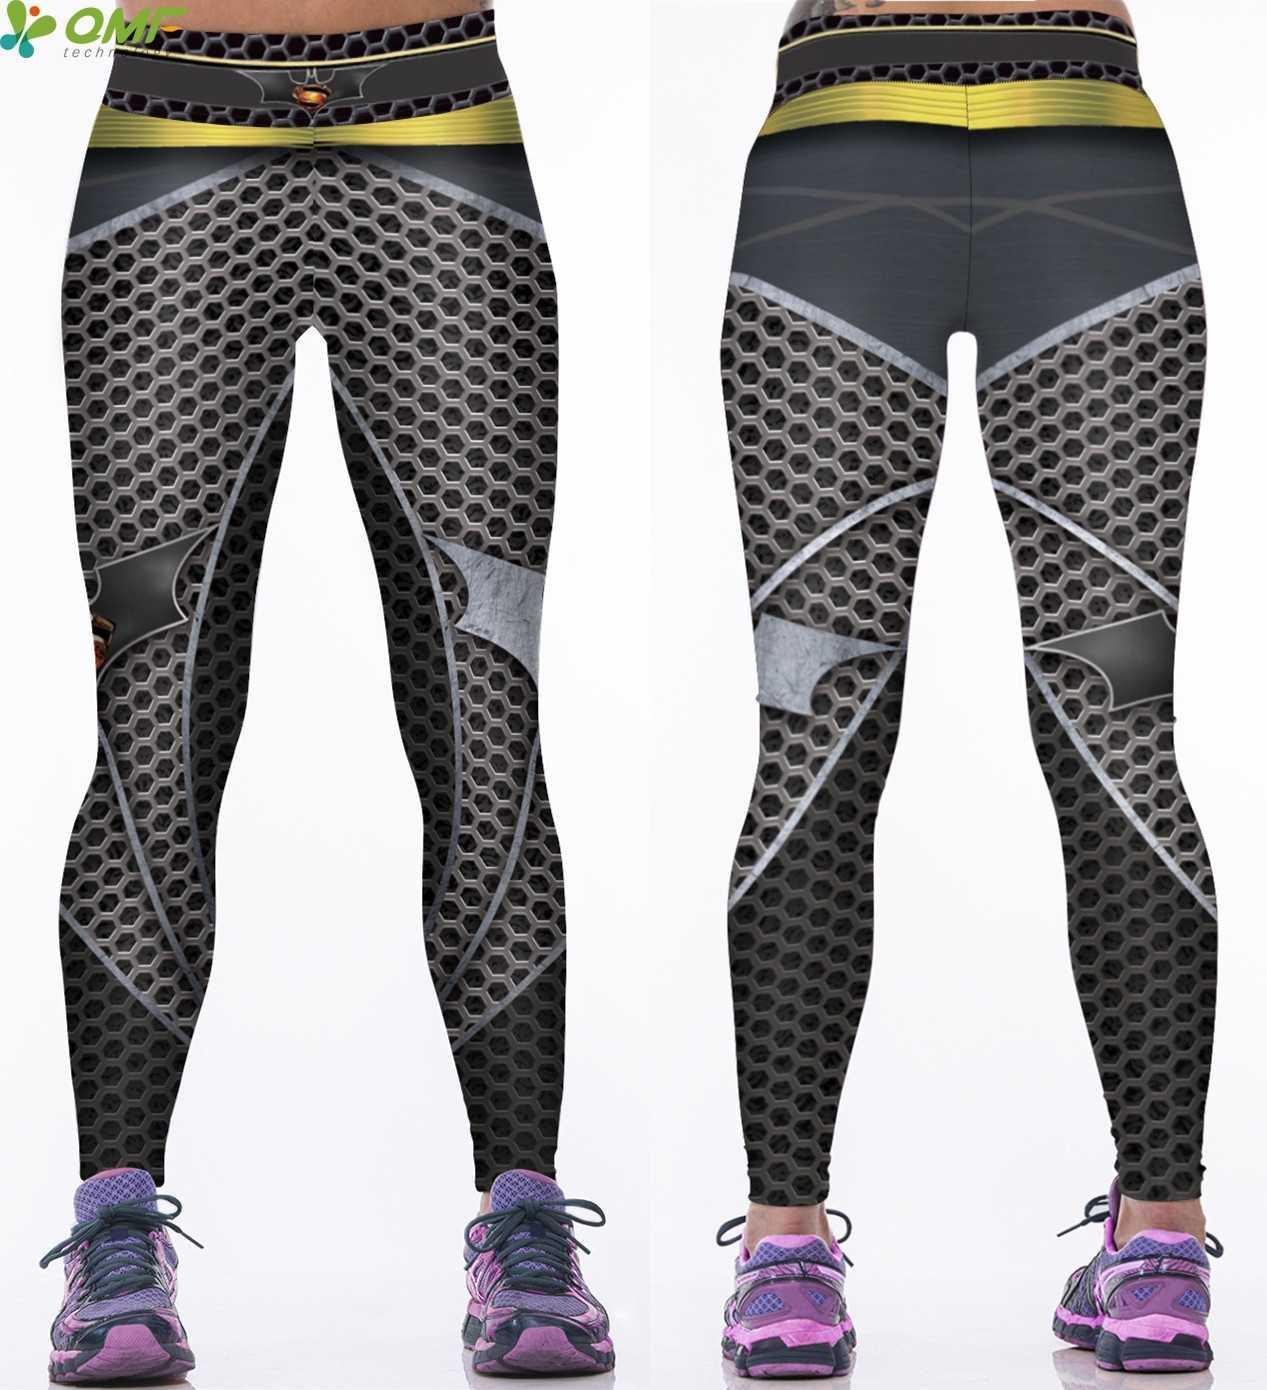 aee5c2739e819e ... Batman V Superman Power Flex Yoga Pants Batman Wonder Woman Running  Tights Justice League Sport Trousers ...